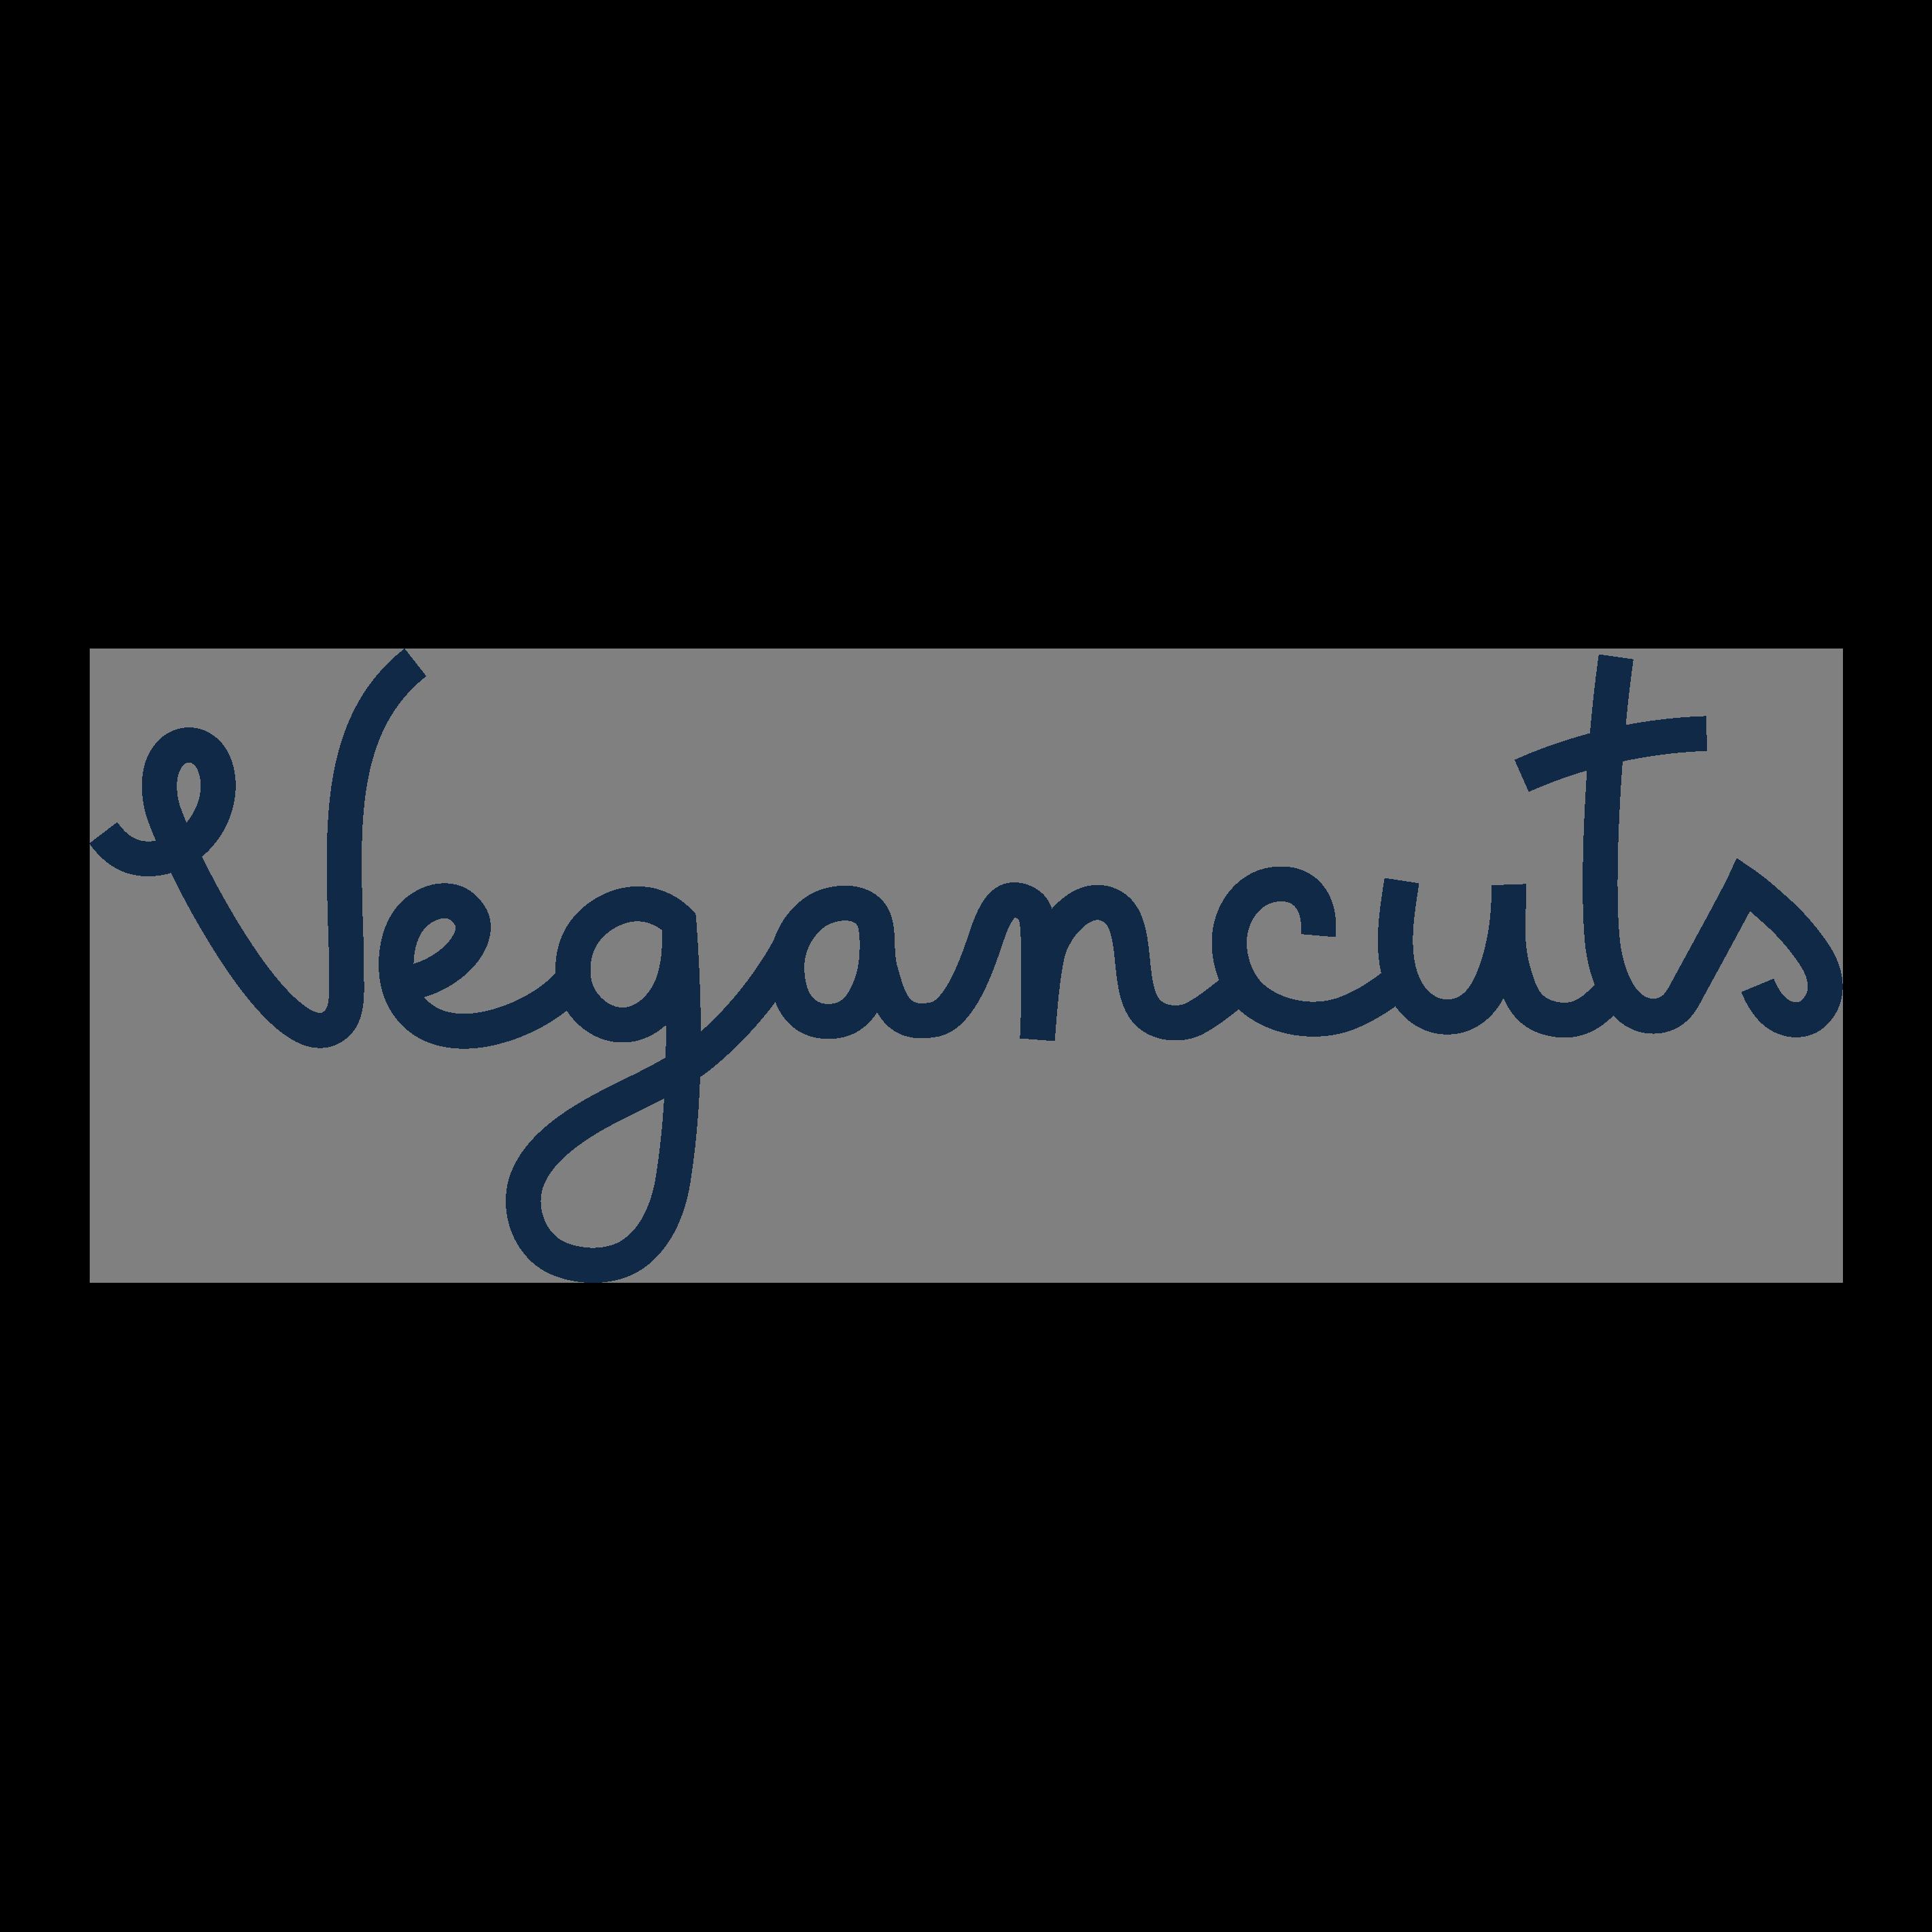 Vegancuts Inc